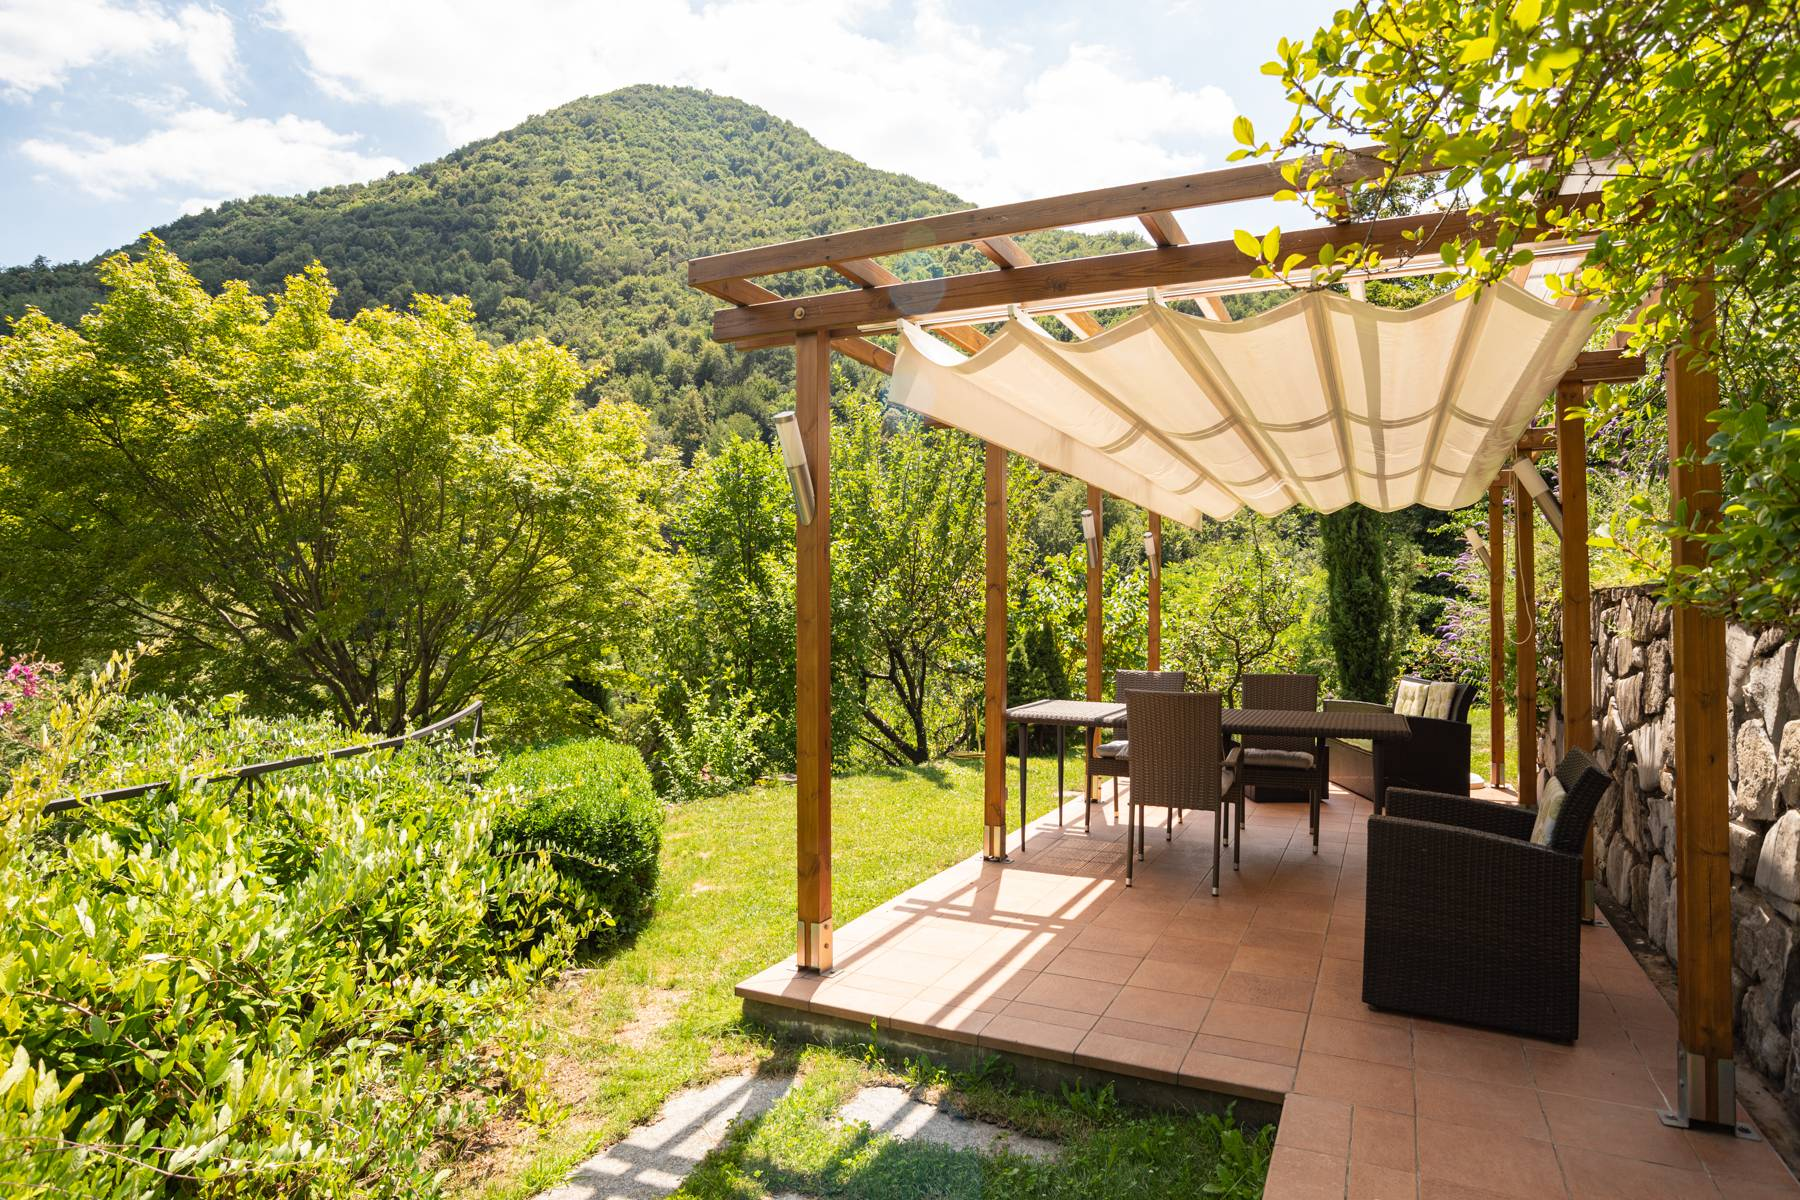 Splendida villa moderna sulla collina soleggiata sopra Argegno - 12